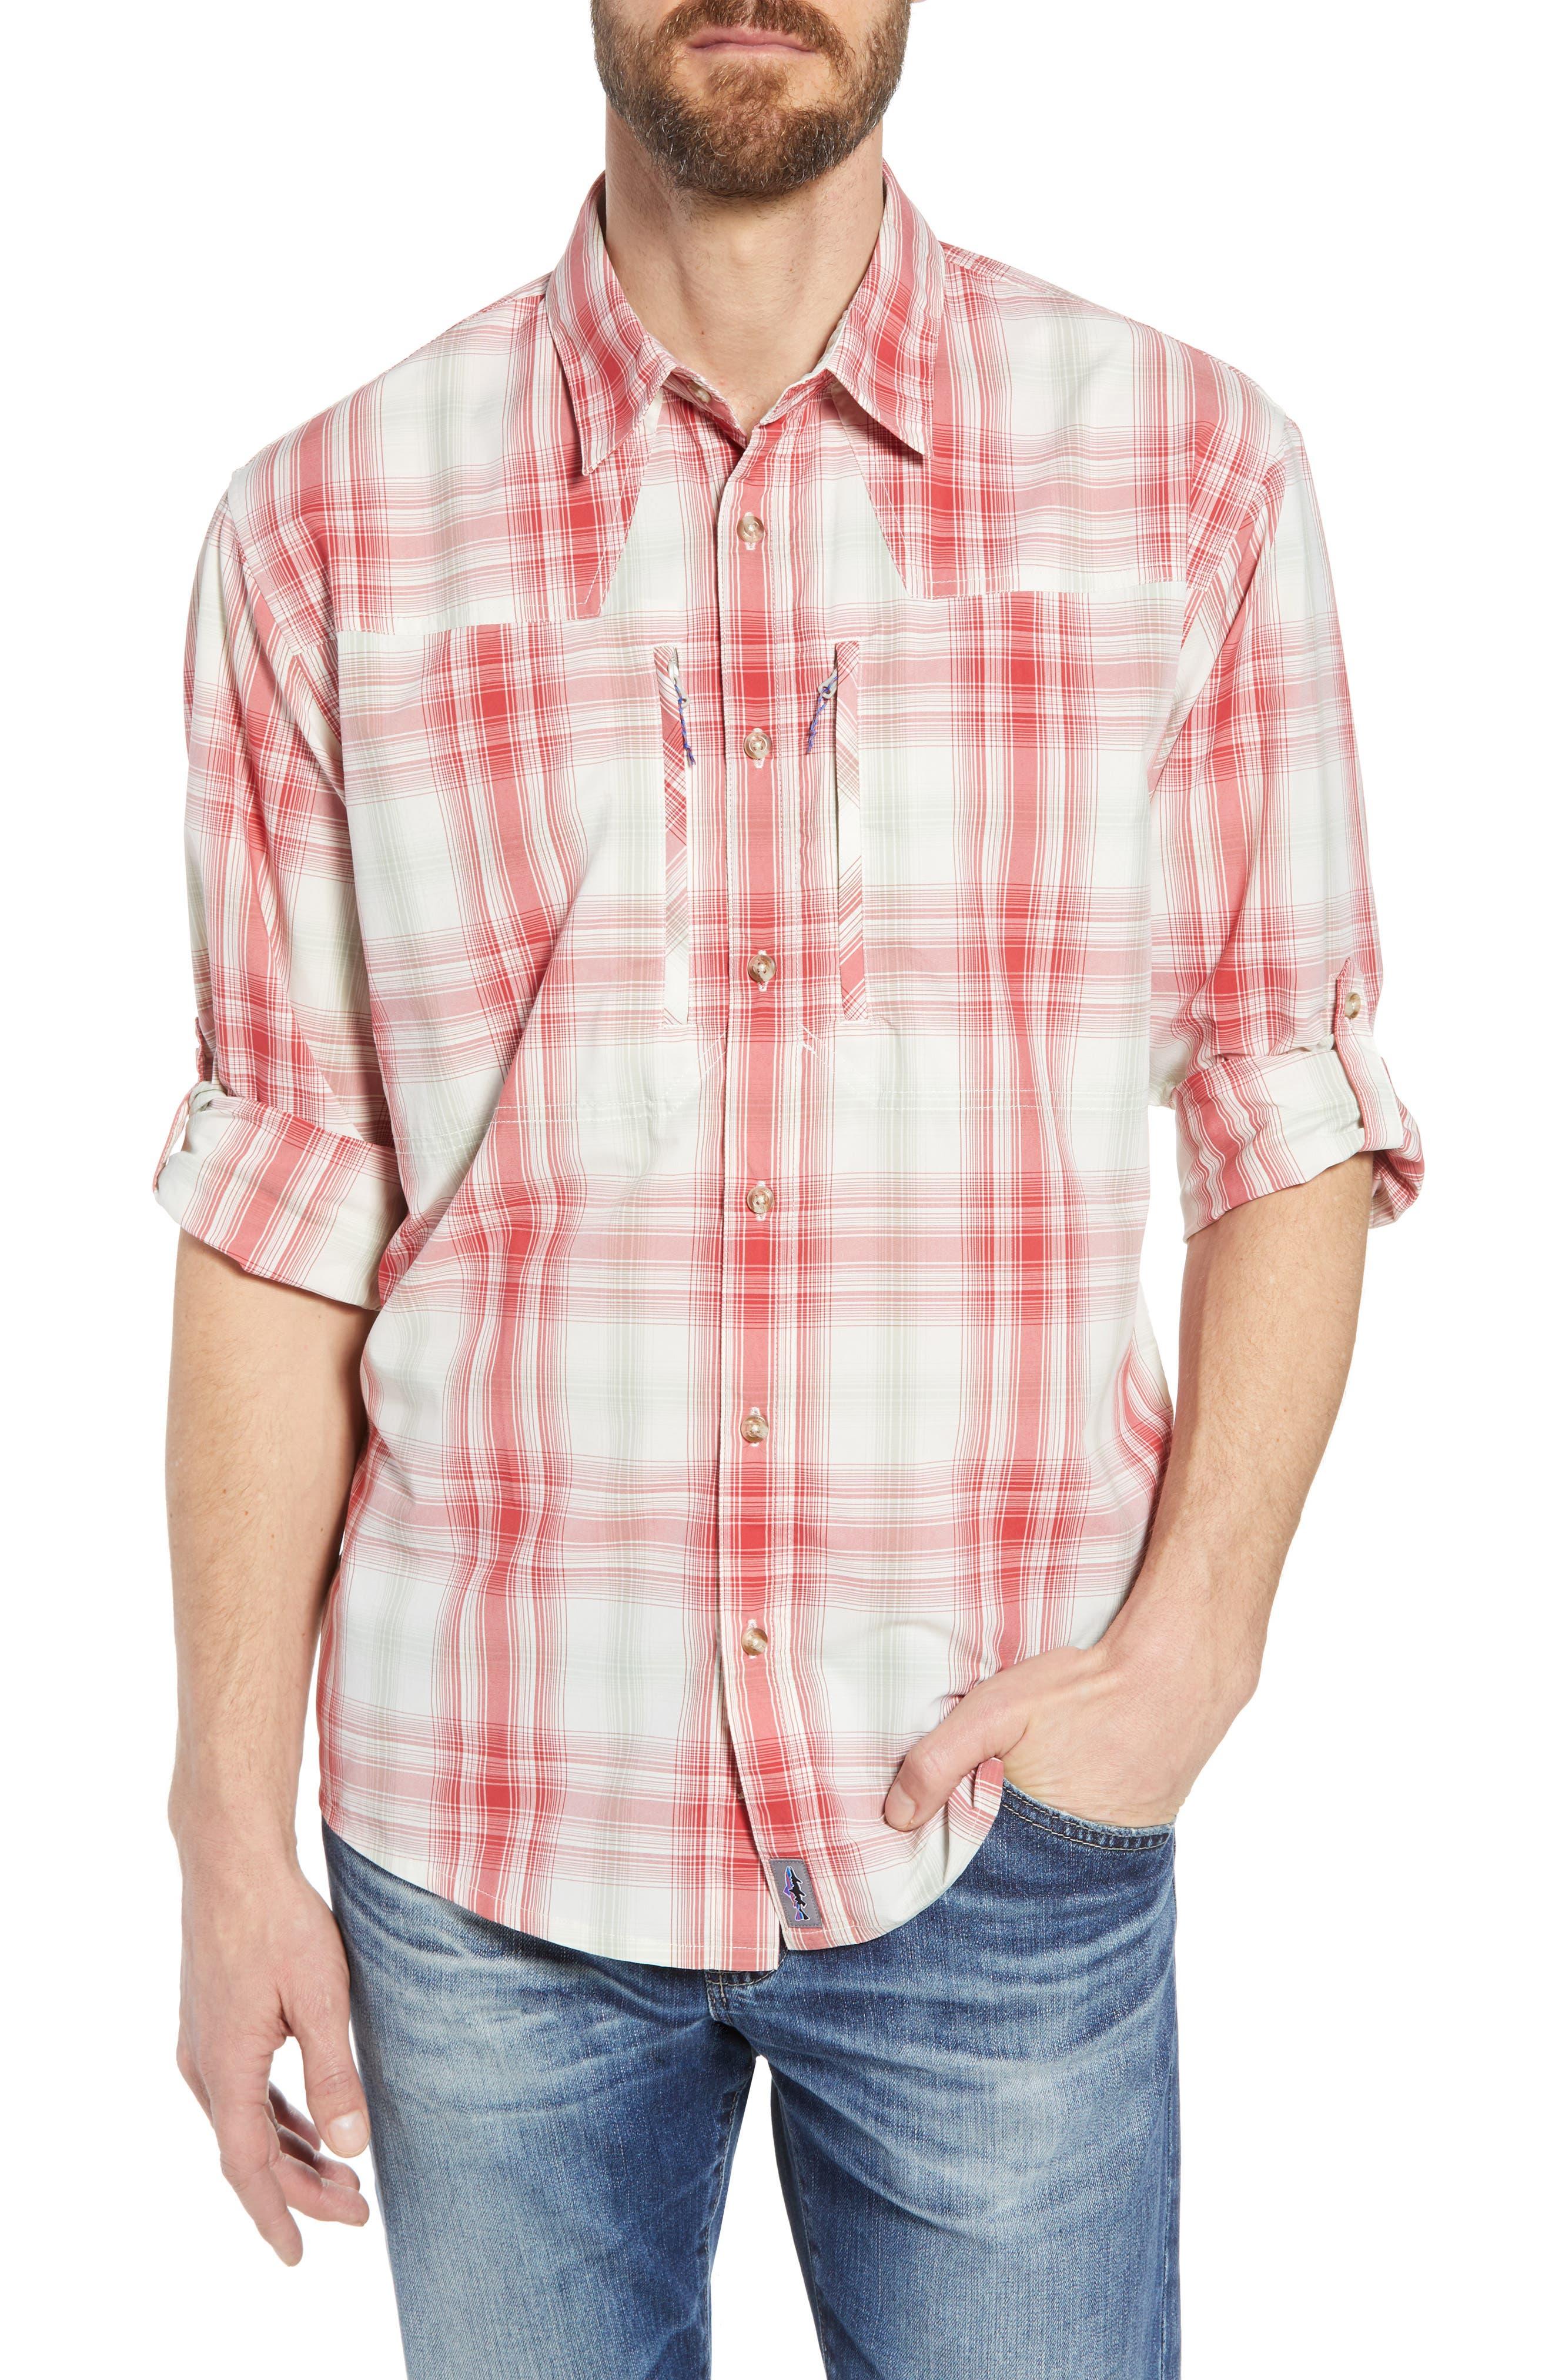 Regular Fit Plaid Sport Shirt,                             Main thumbnail 1, color,                             King Swing/ Static Red